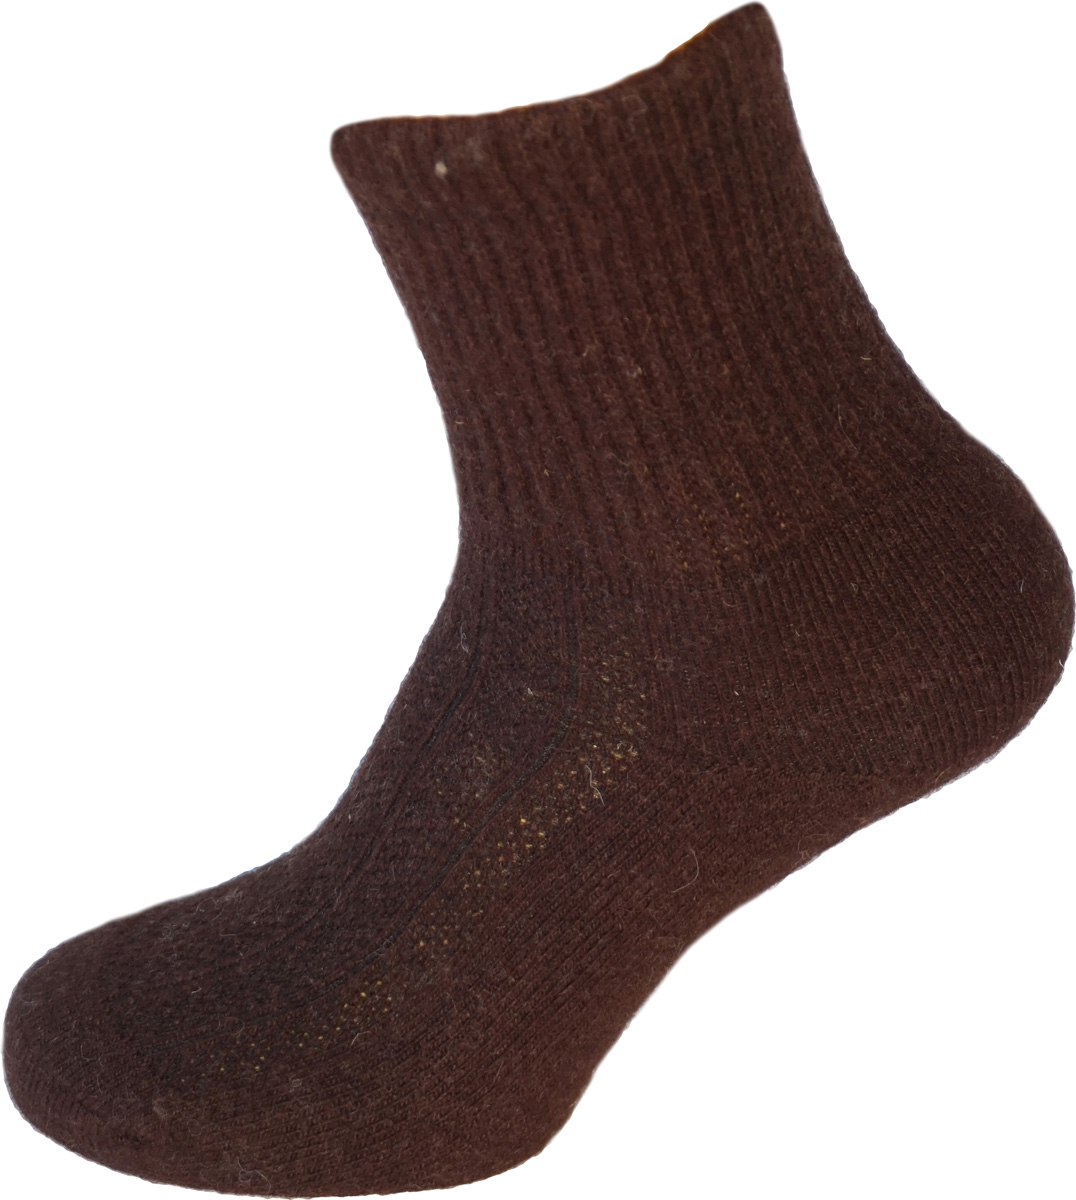 Термоноски BG Yak Wool, цвет: темно-коричневый. 825586_4. Размер 37/39